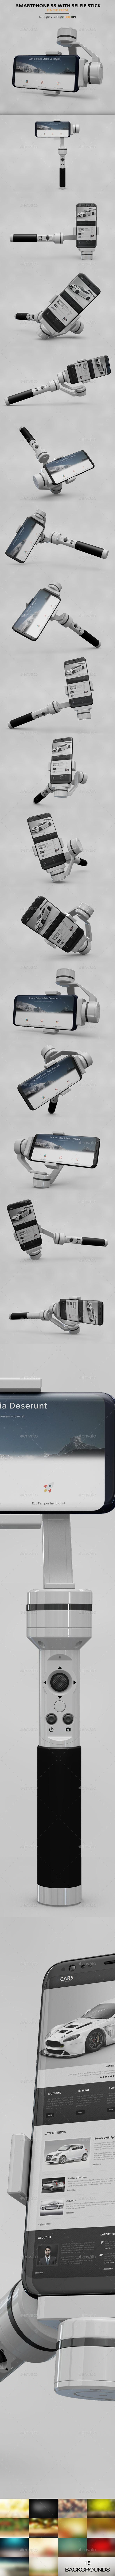 SmartPhone S8 Selfie Stick 2017 MockUp - Product Mock-Ups Graphics